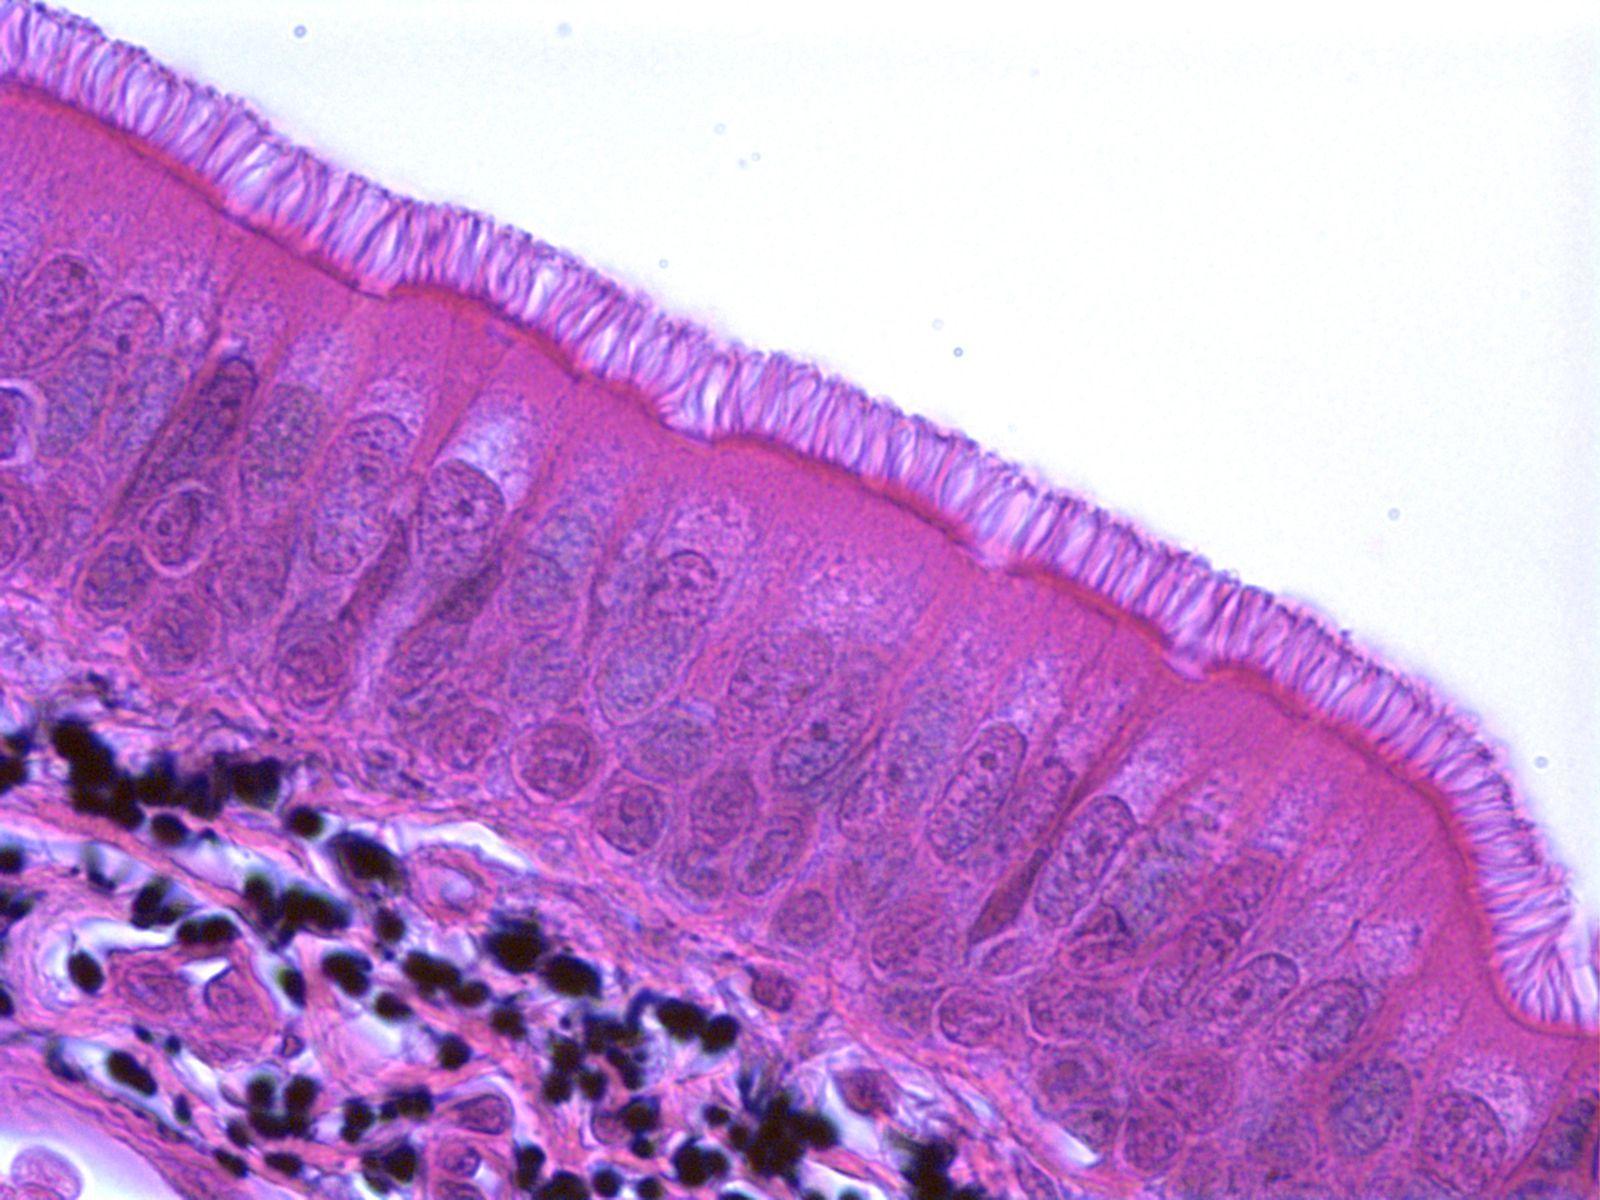 pseudostratified columnar epithelium - Google Search   Microscopia ...